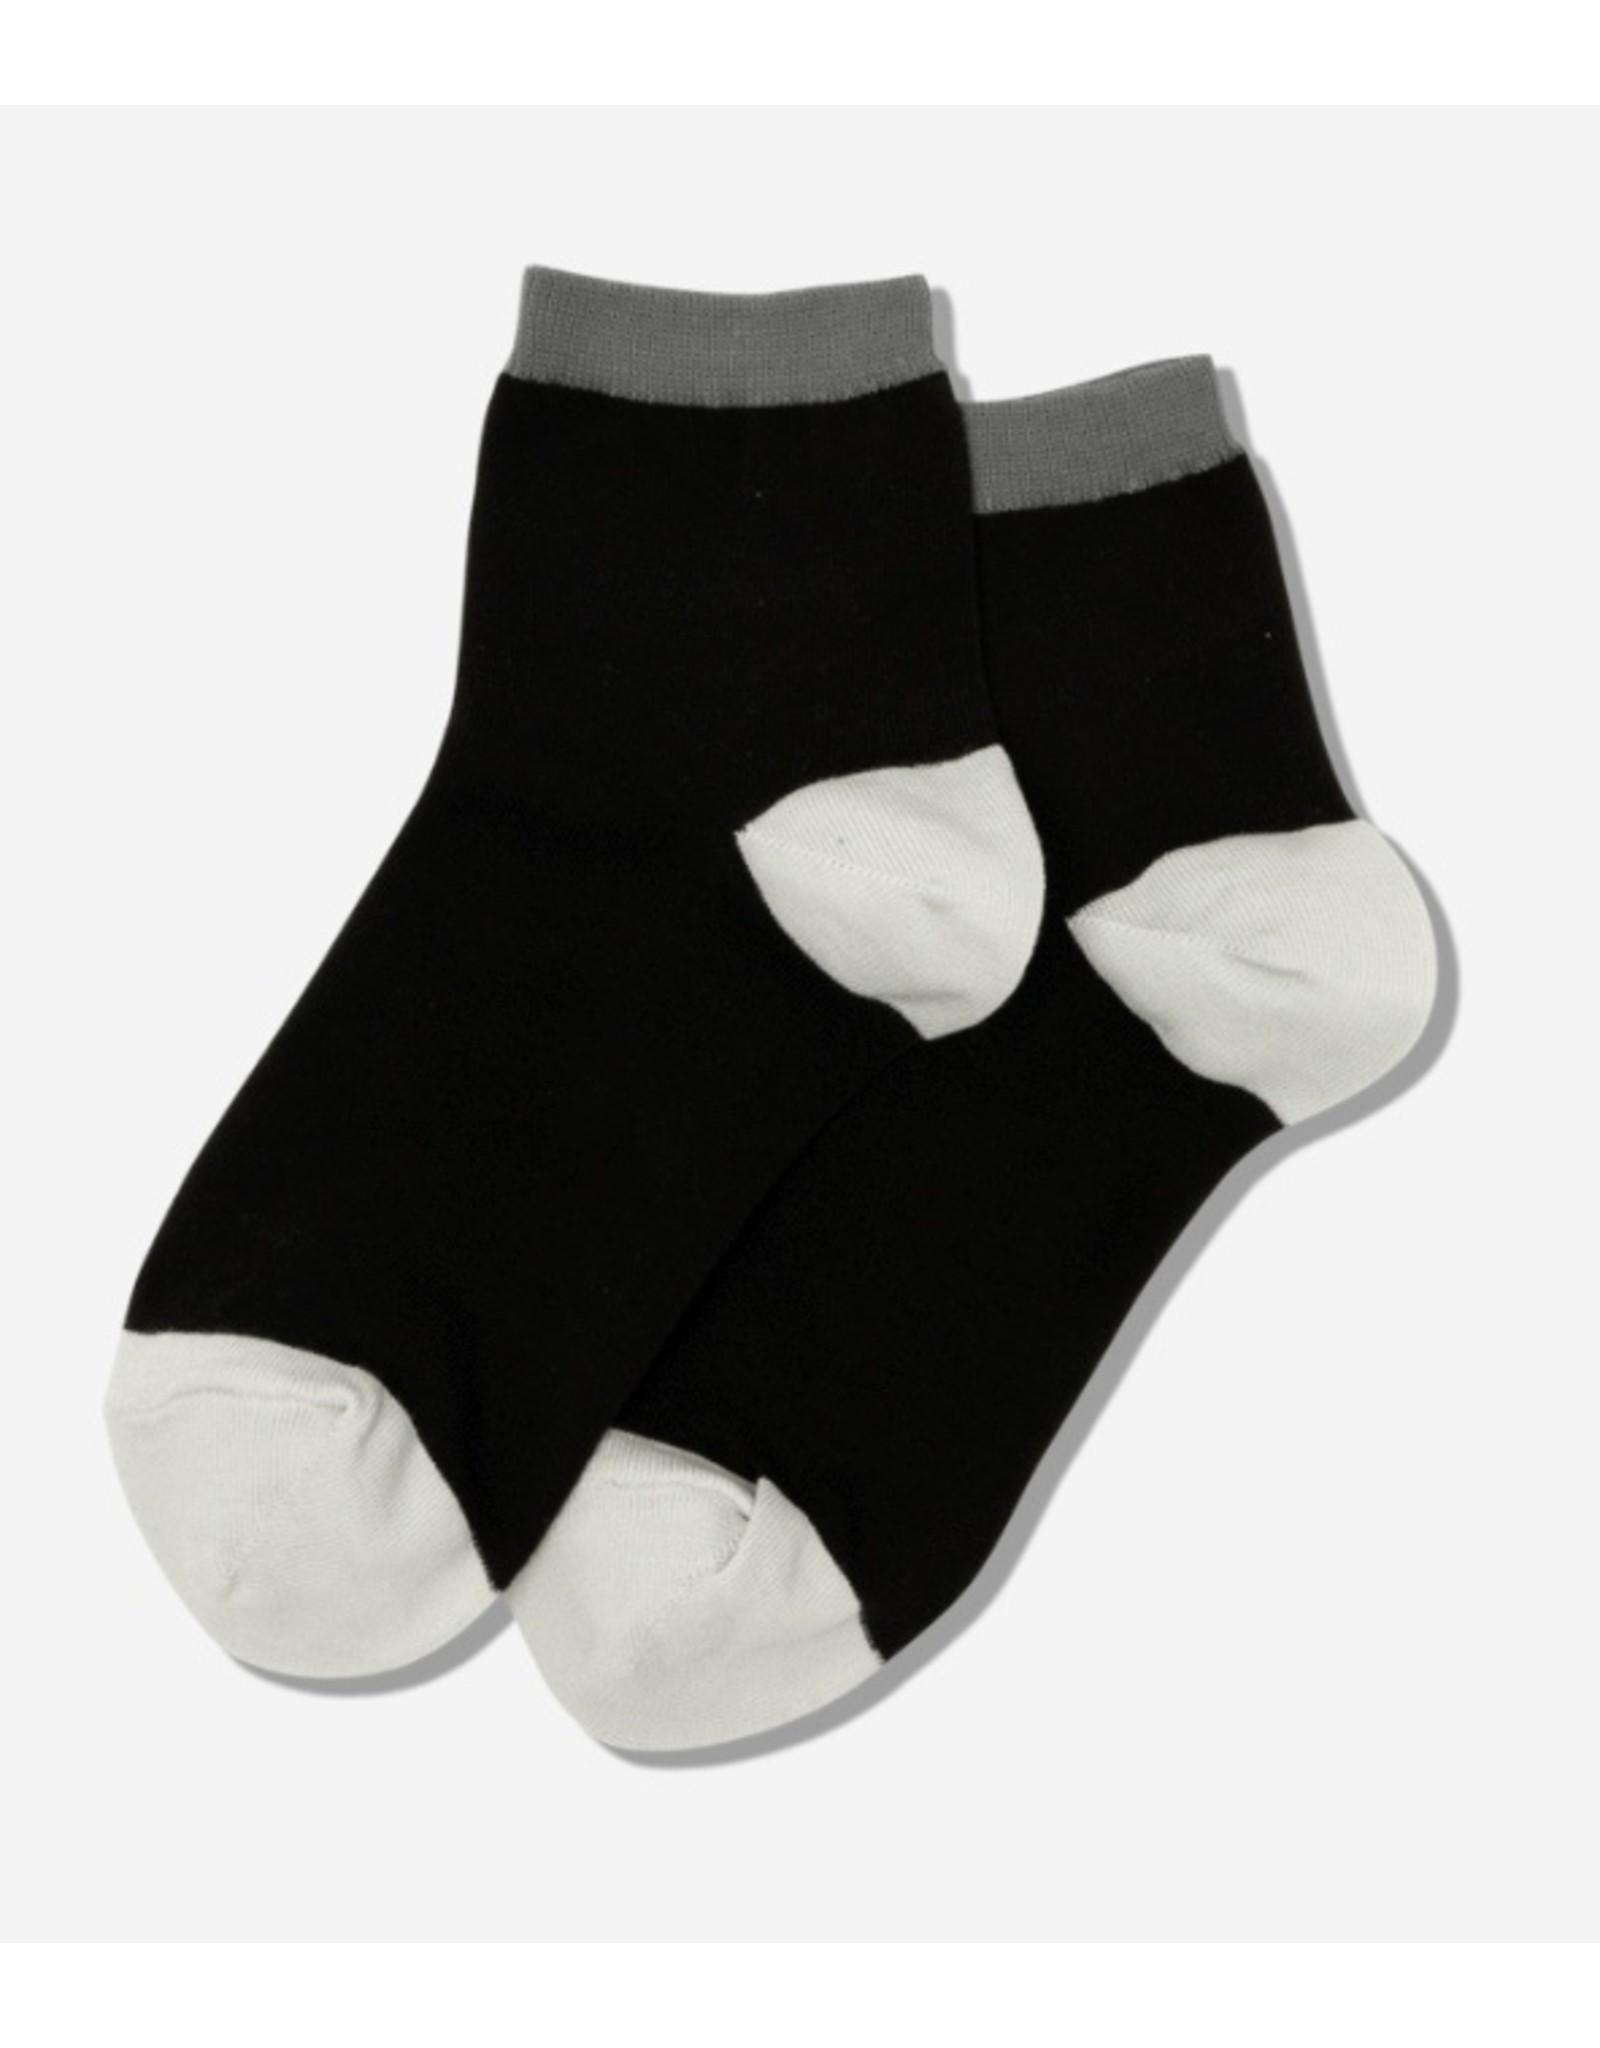 Hotsox Hotsox Women's Contrast Cuff Anklet Socks HSW300101